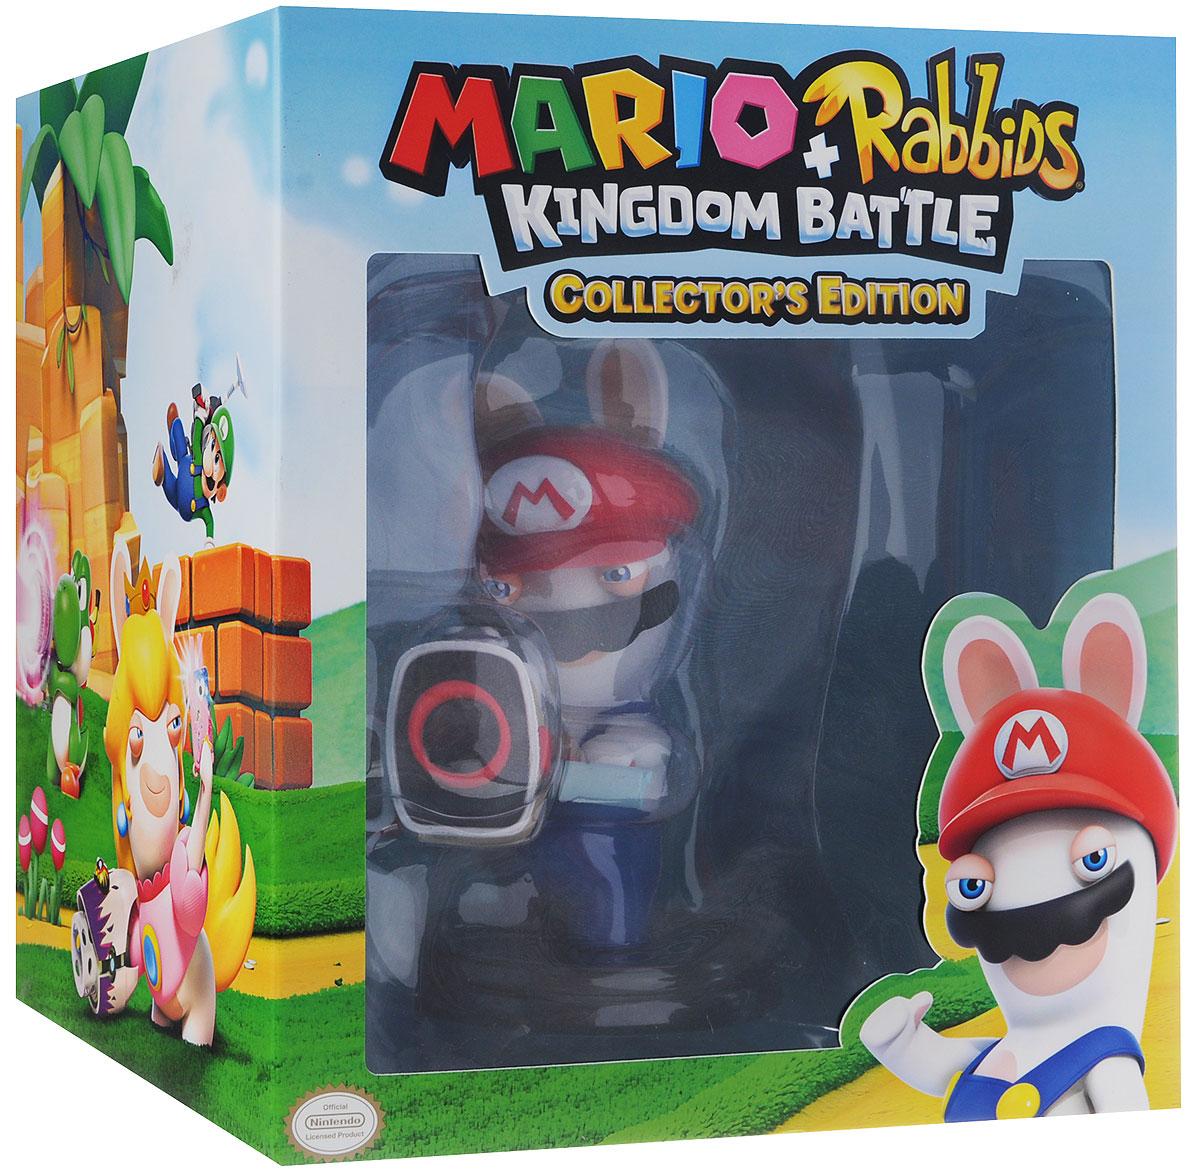 Mario + Rabbids Битва за королевство. Коллекционное издание (Nintendo Switch) коллекционная фигурка mario rabbids битва за королевство – кролик луиджи 15 24 см